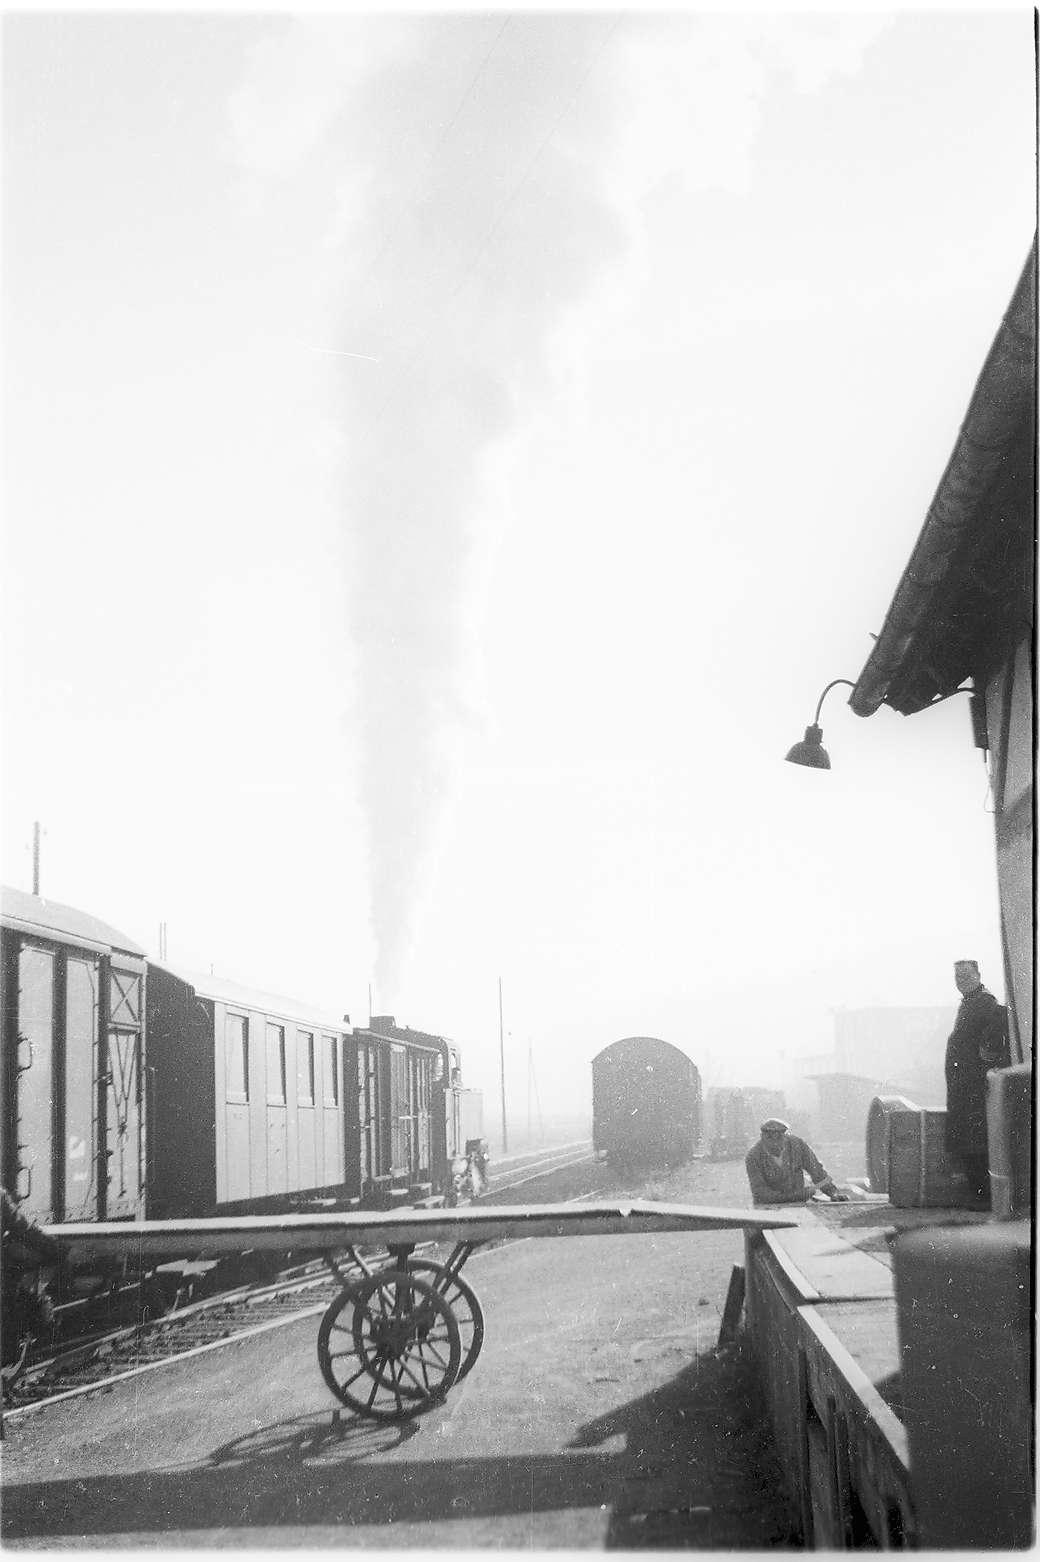 Bahnhof Rangendingen, Lok 16, abblasend, bewegliche Rampe zum Güterschuppen, Bild 1